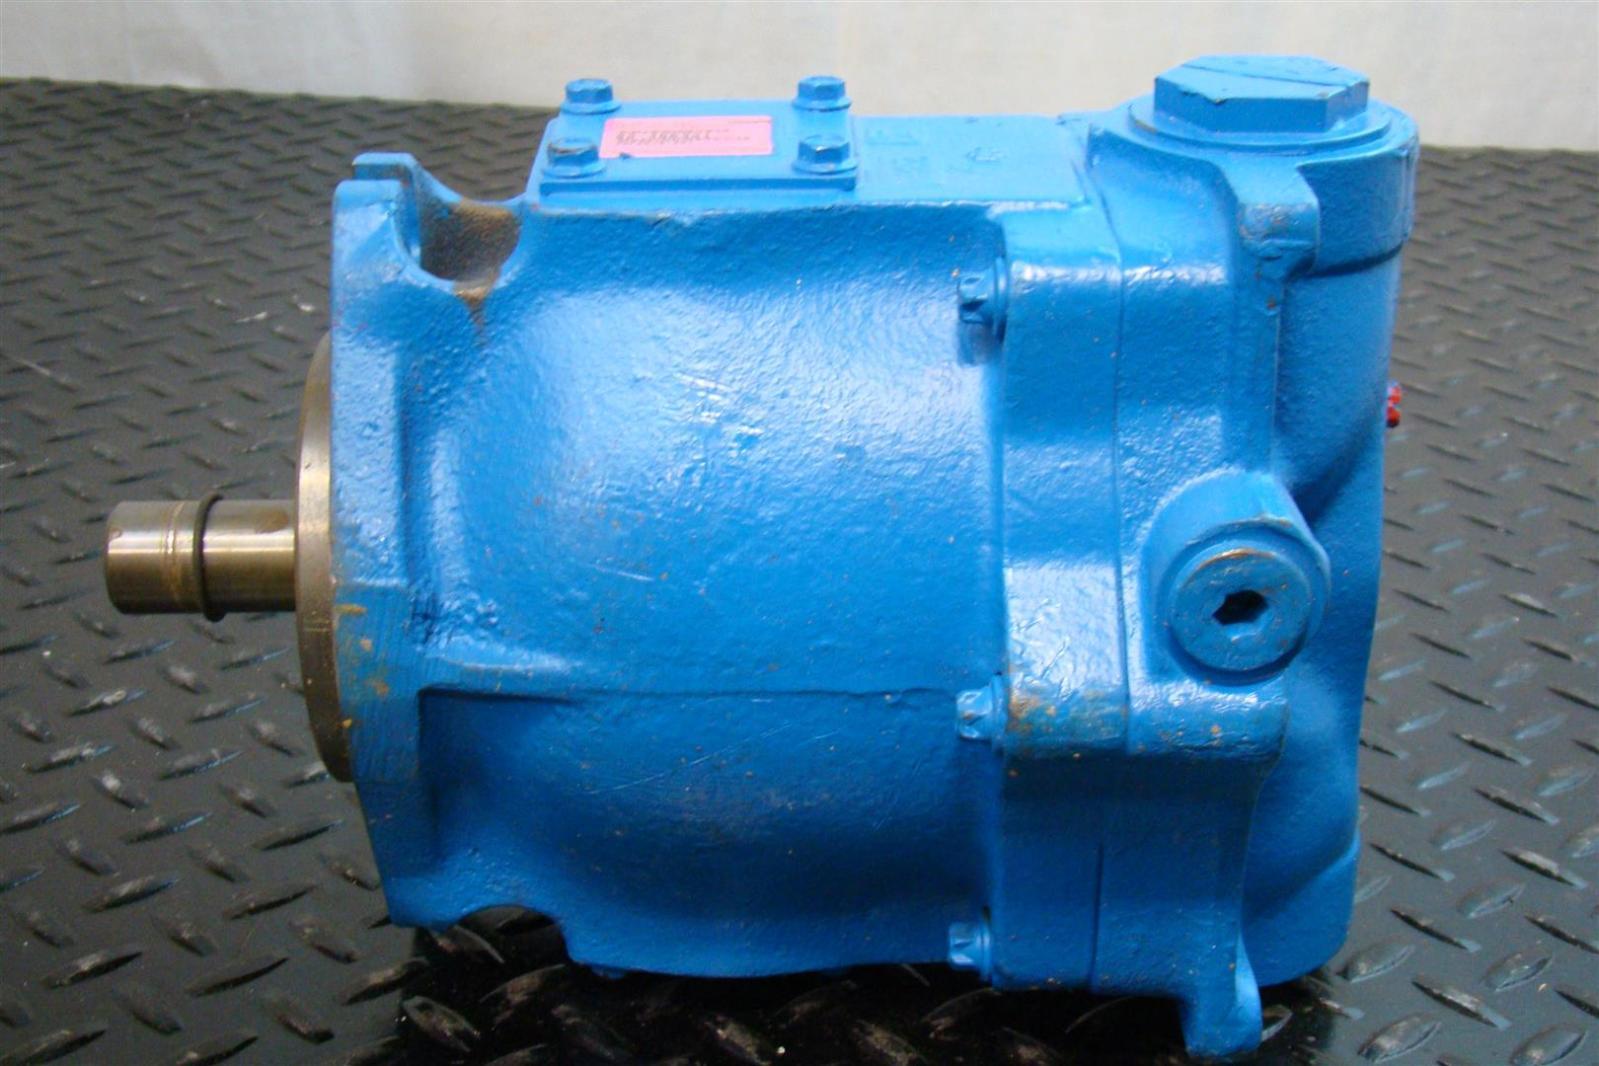 Details about Eaton Vickers Hydraulic Pump 67501 20F05UB1001  PV040AR02AA30J0100000100100CD0AF